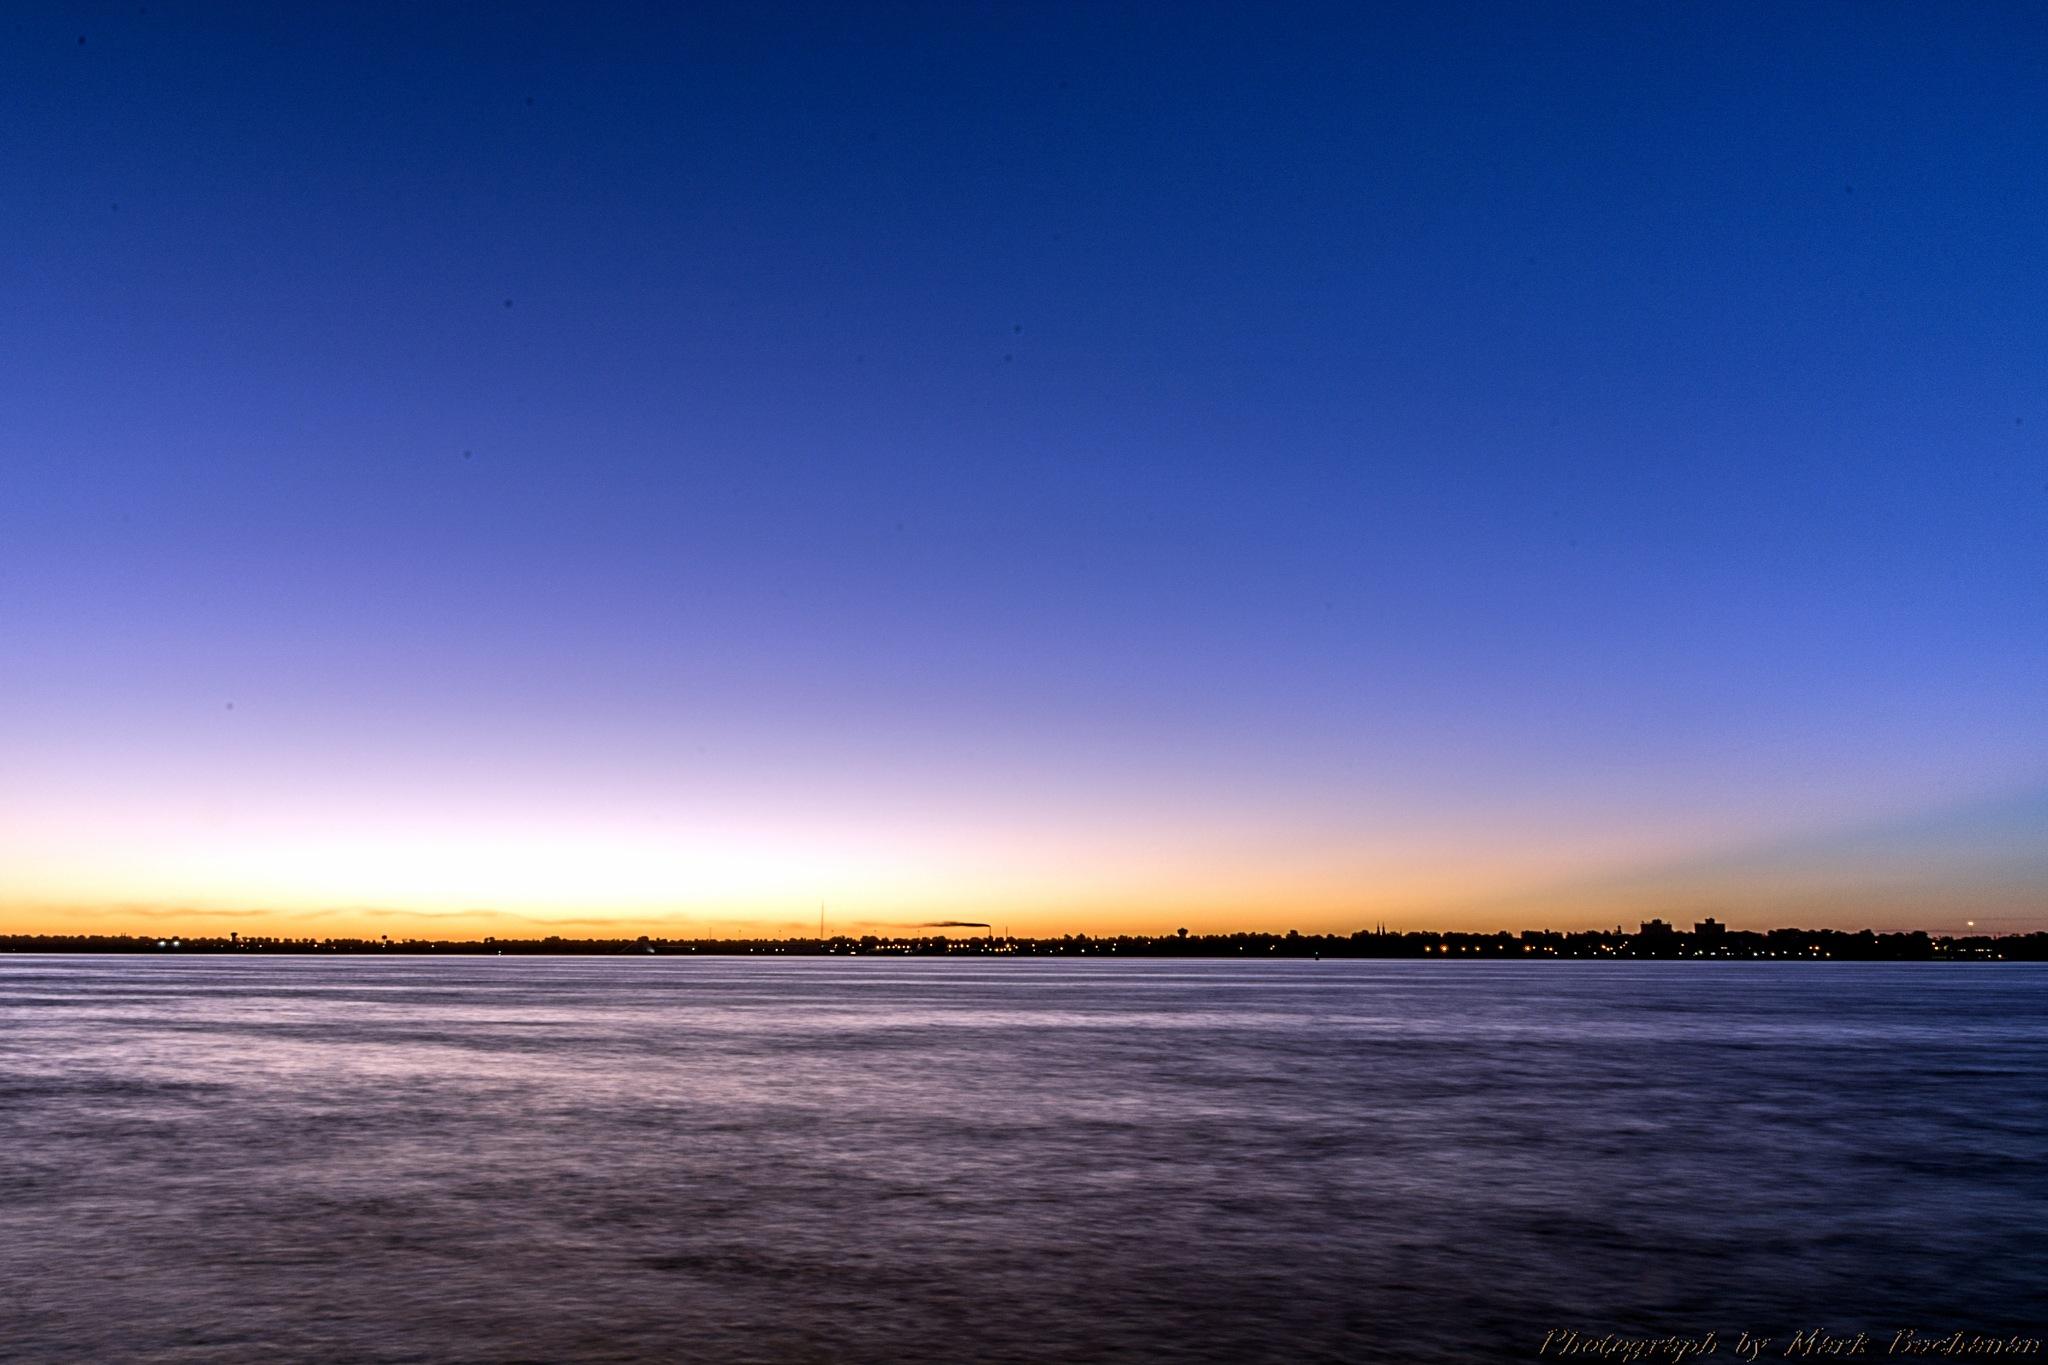 Sunrise Prescott #3 by Mark Buchanan